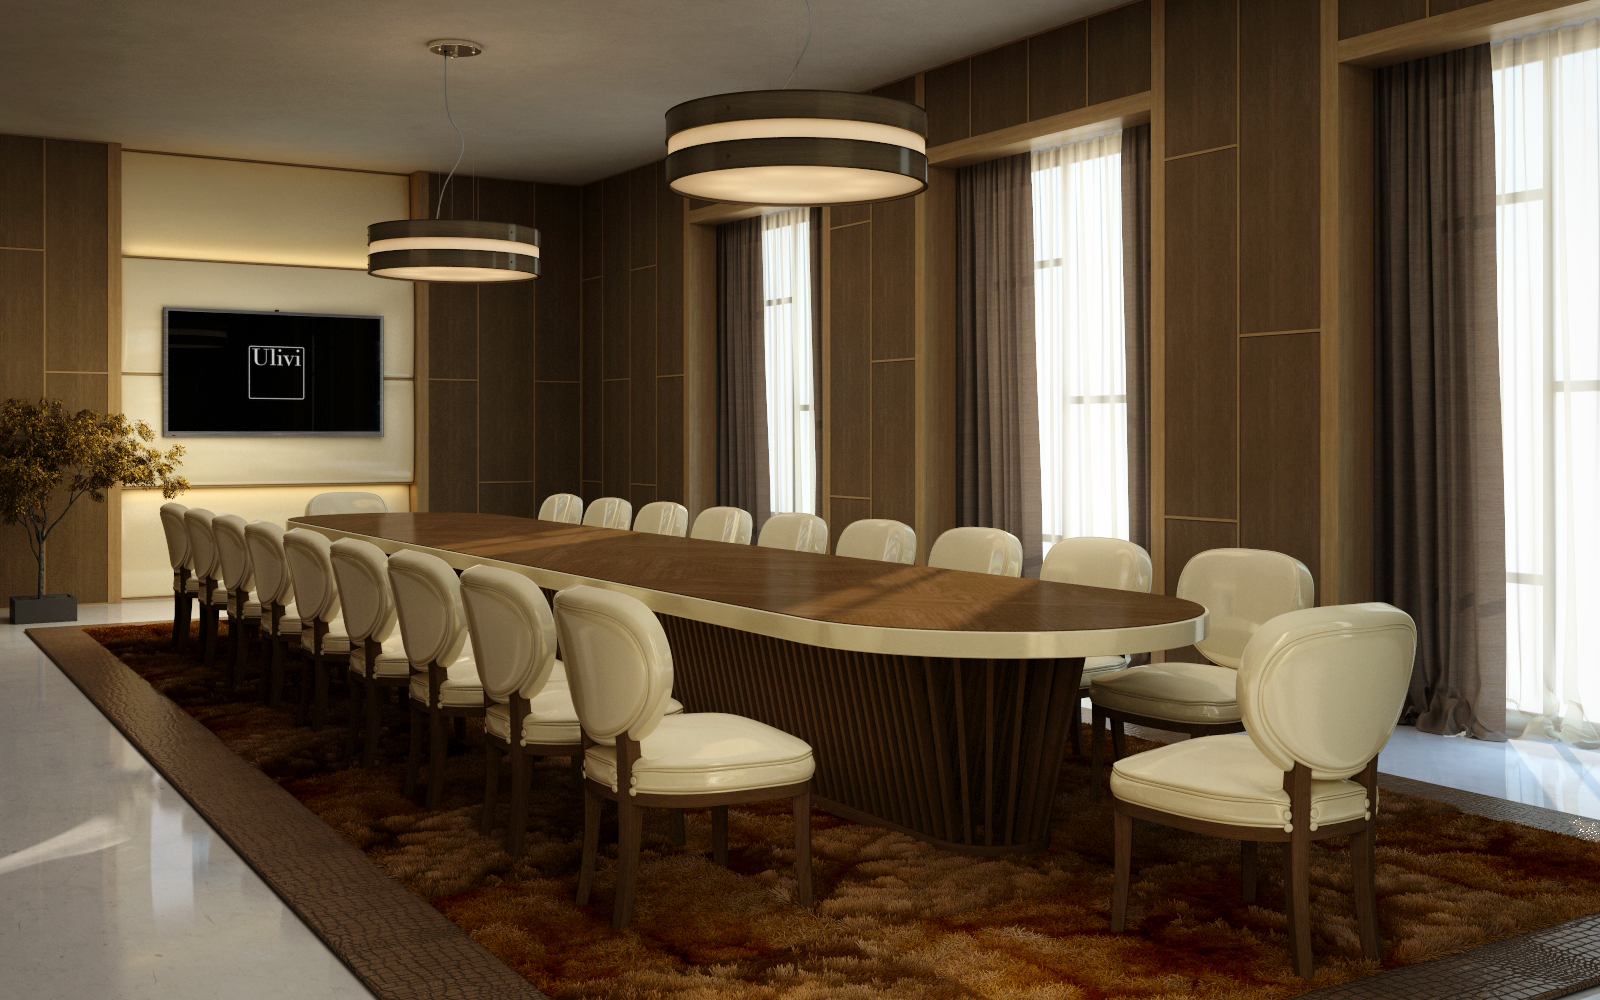 Ulivi Salotti board room - An Ode to Leather @ Masha Shapiro Agency .jpg